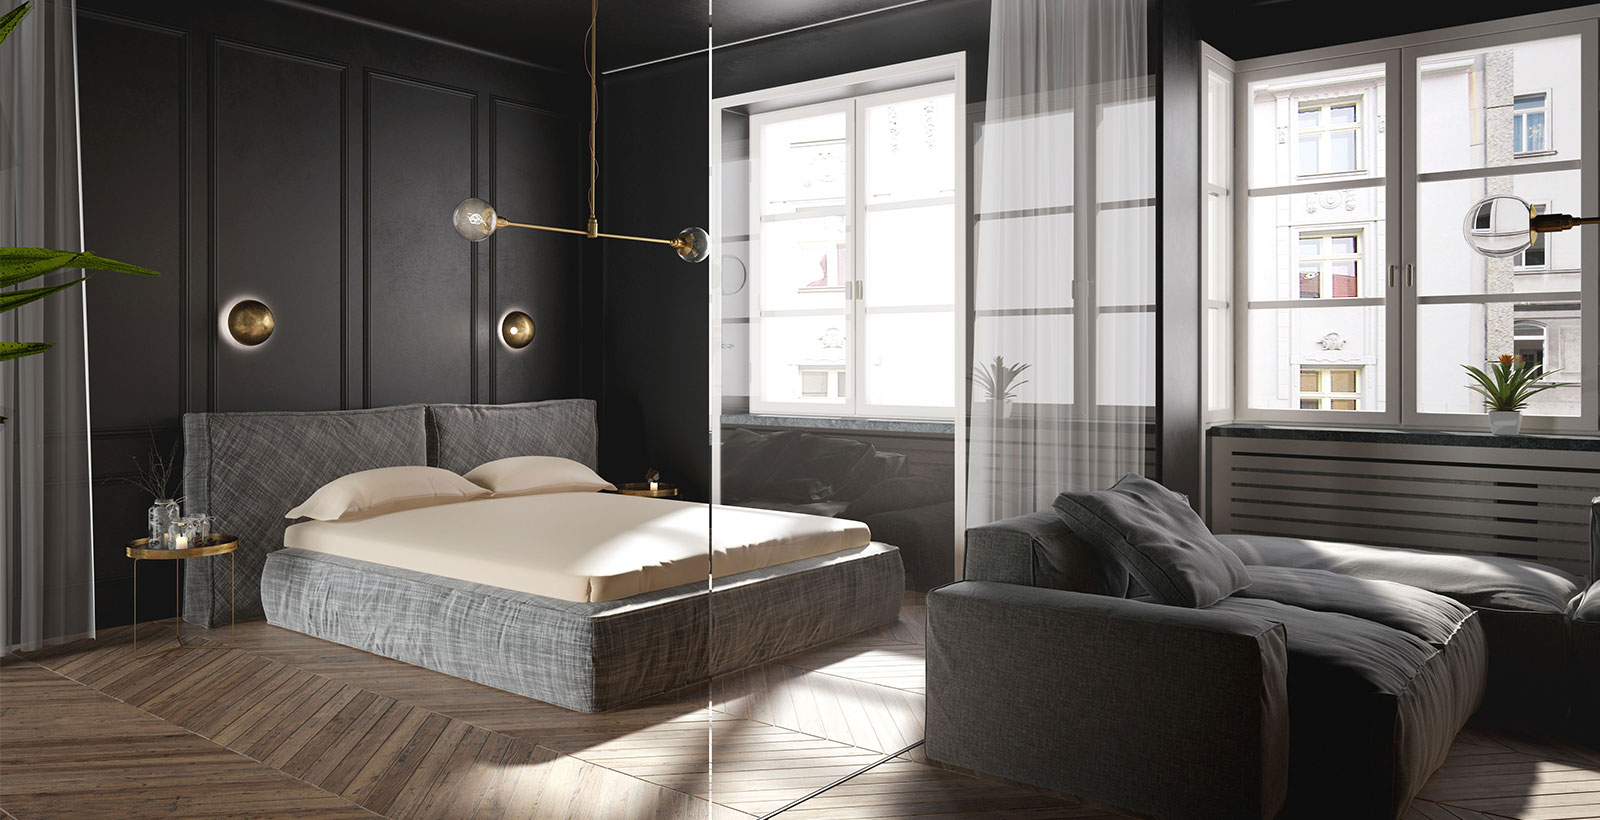 Chambre style glamour Oknoplast